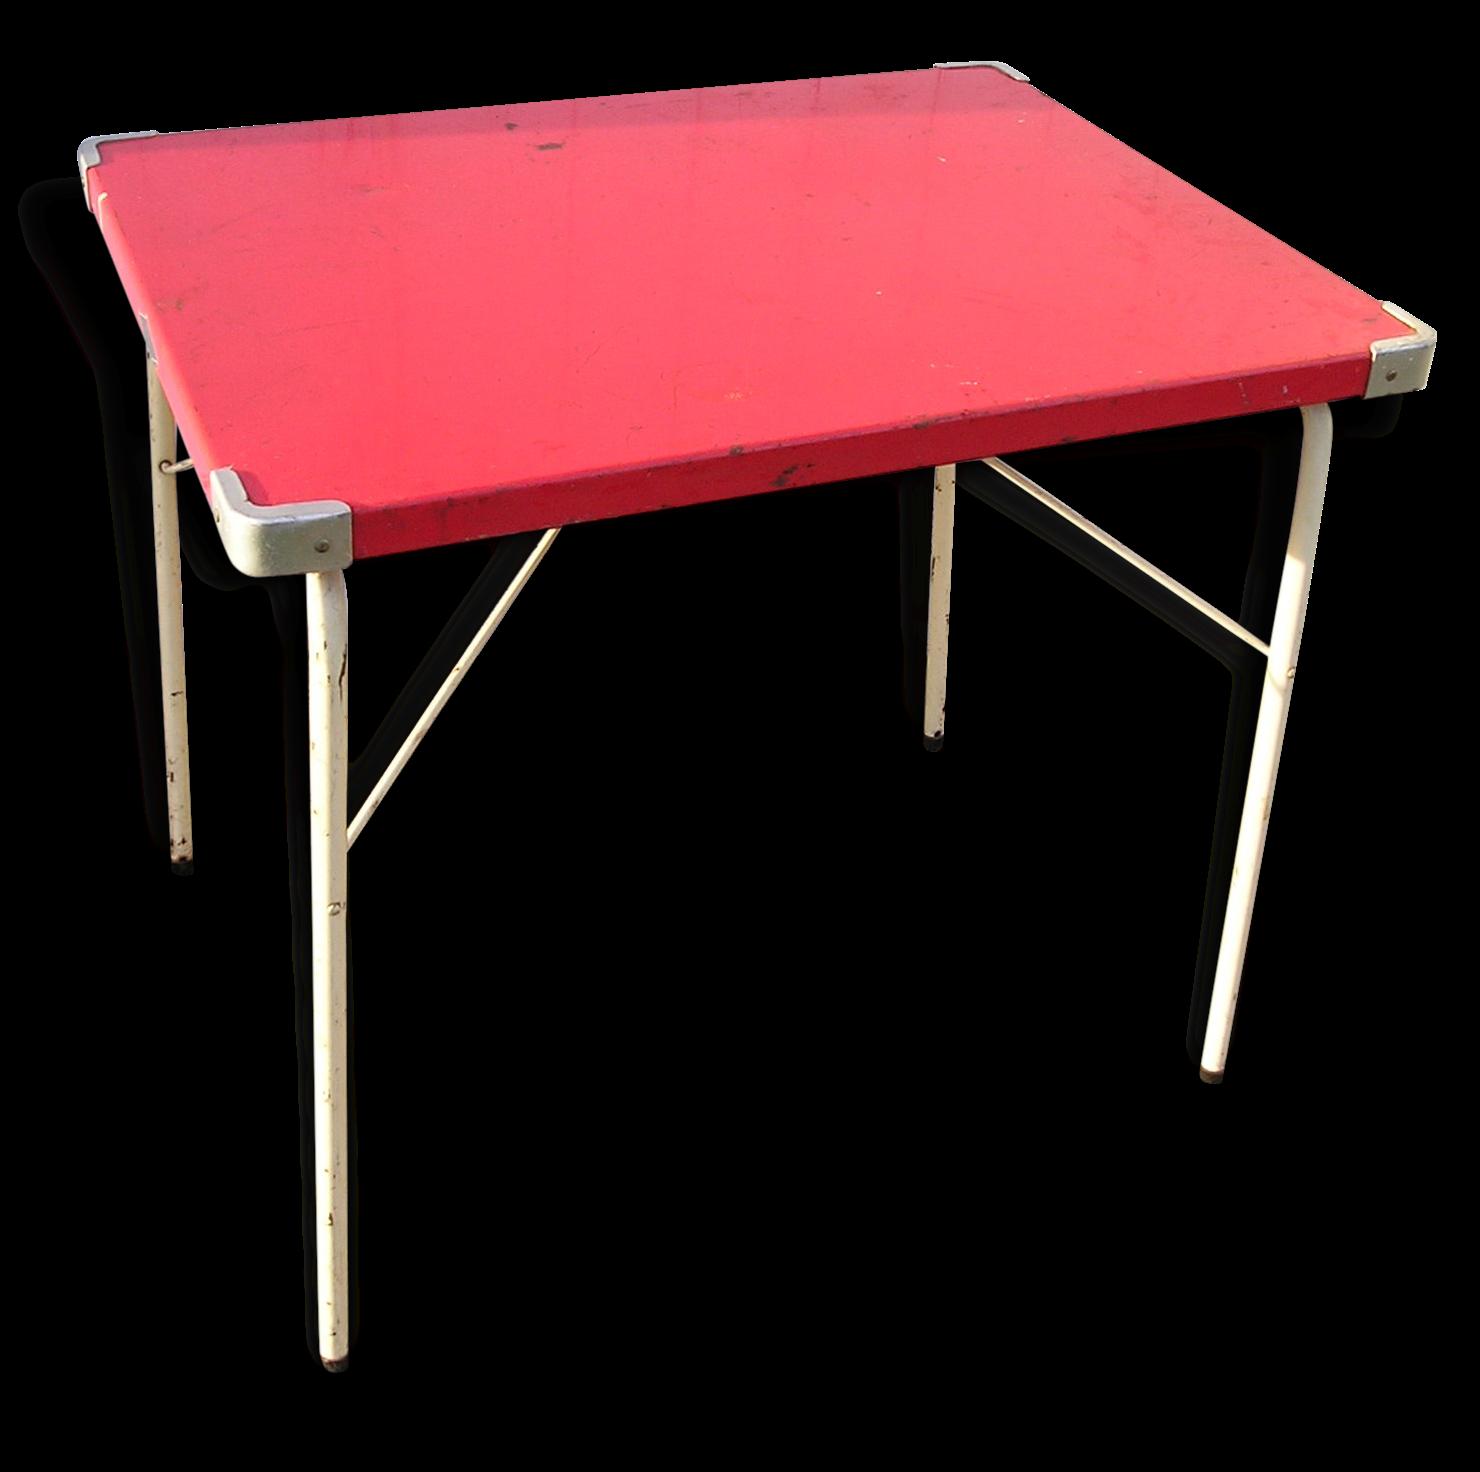 table de couture pliante great table with table de. Black Bedroom Furniture Sets. Home Design Ideas